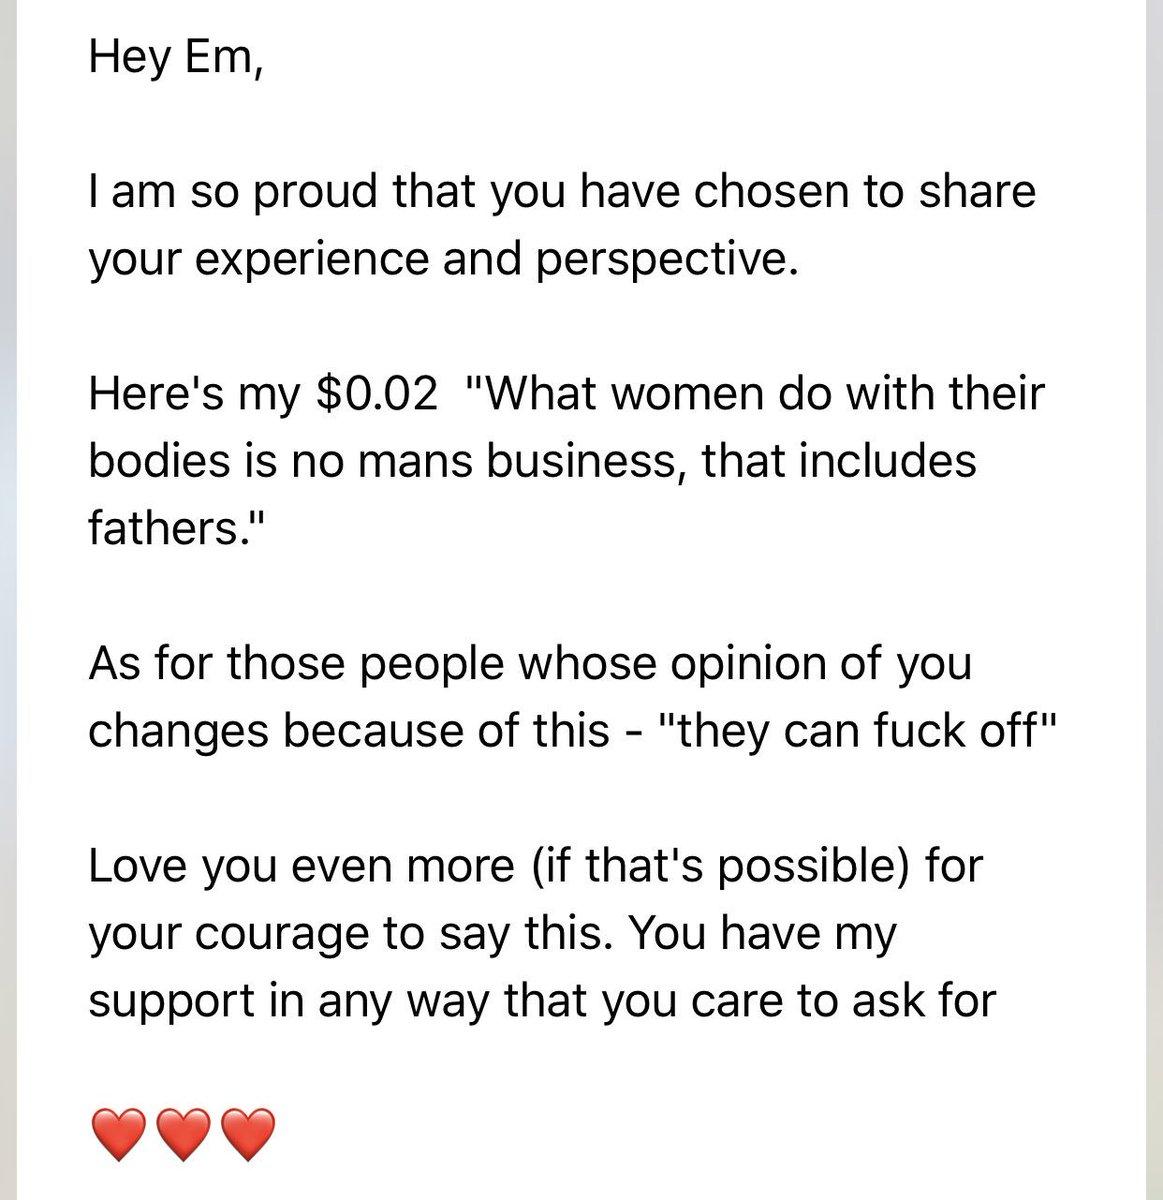 Emma Espiner on Twitter: